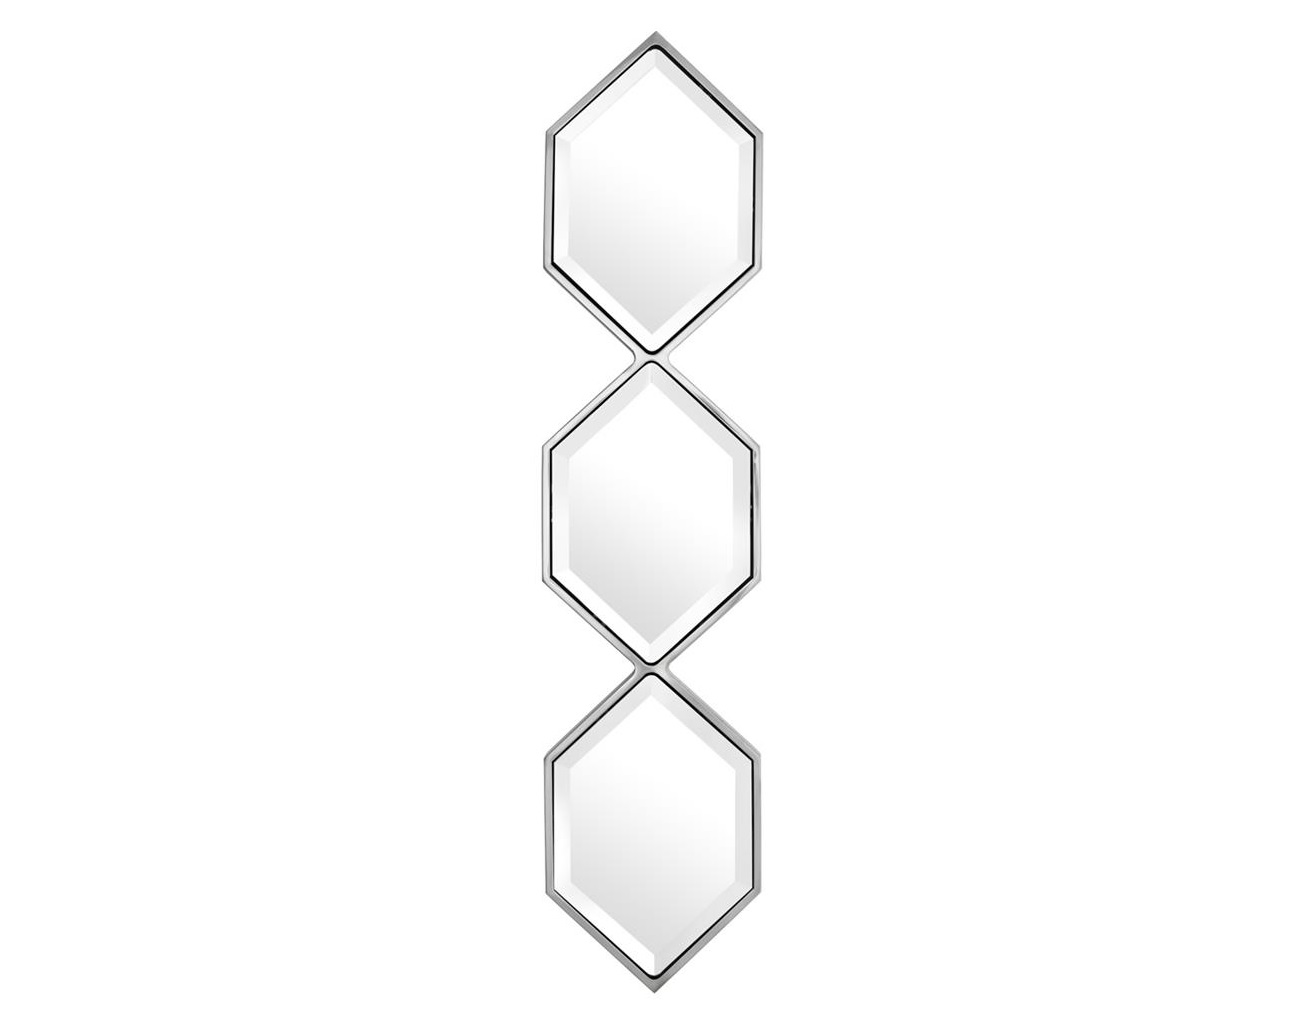 Зеркало SaronnoНастенные зеркала<br><br><br>Material: Металл<br>Ширина см: 25.0<br>Высота см: 110.0